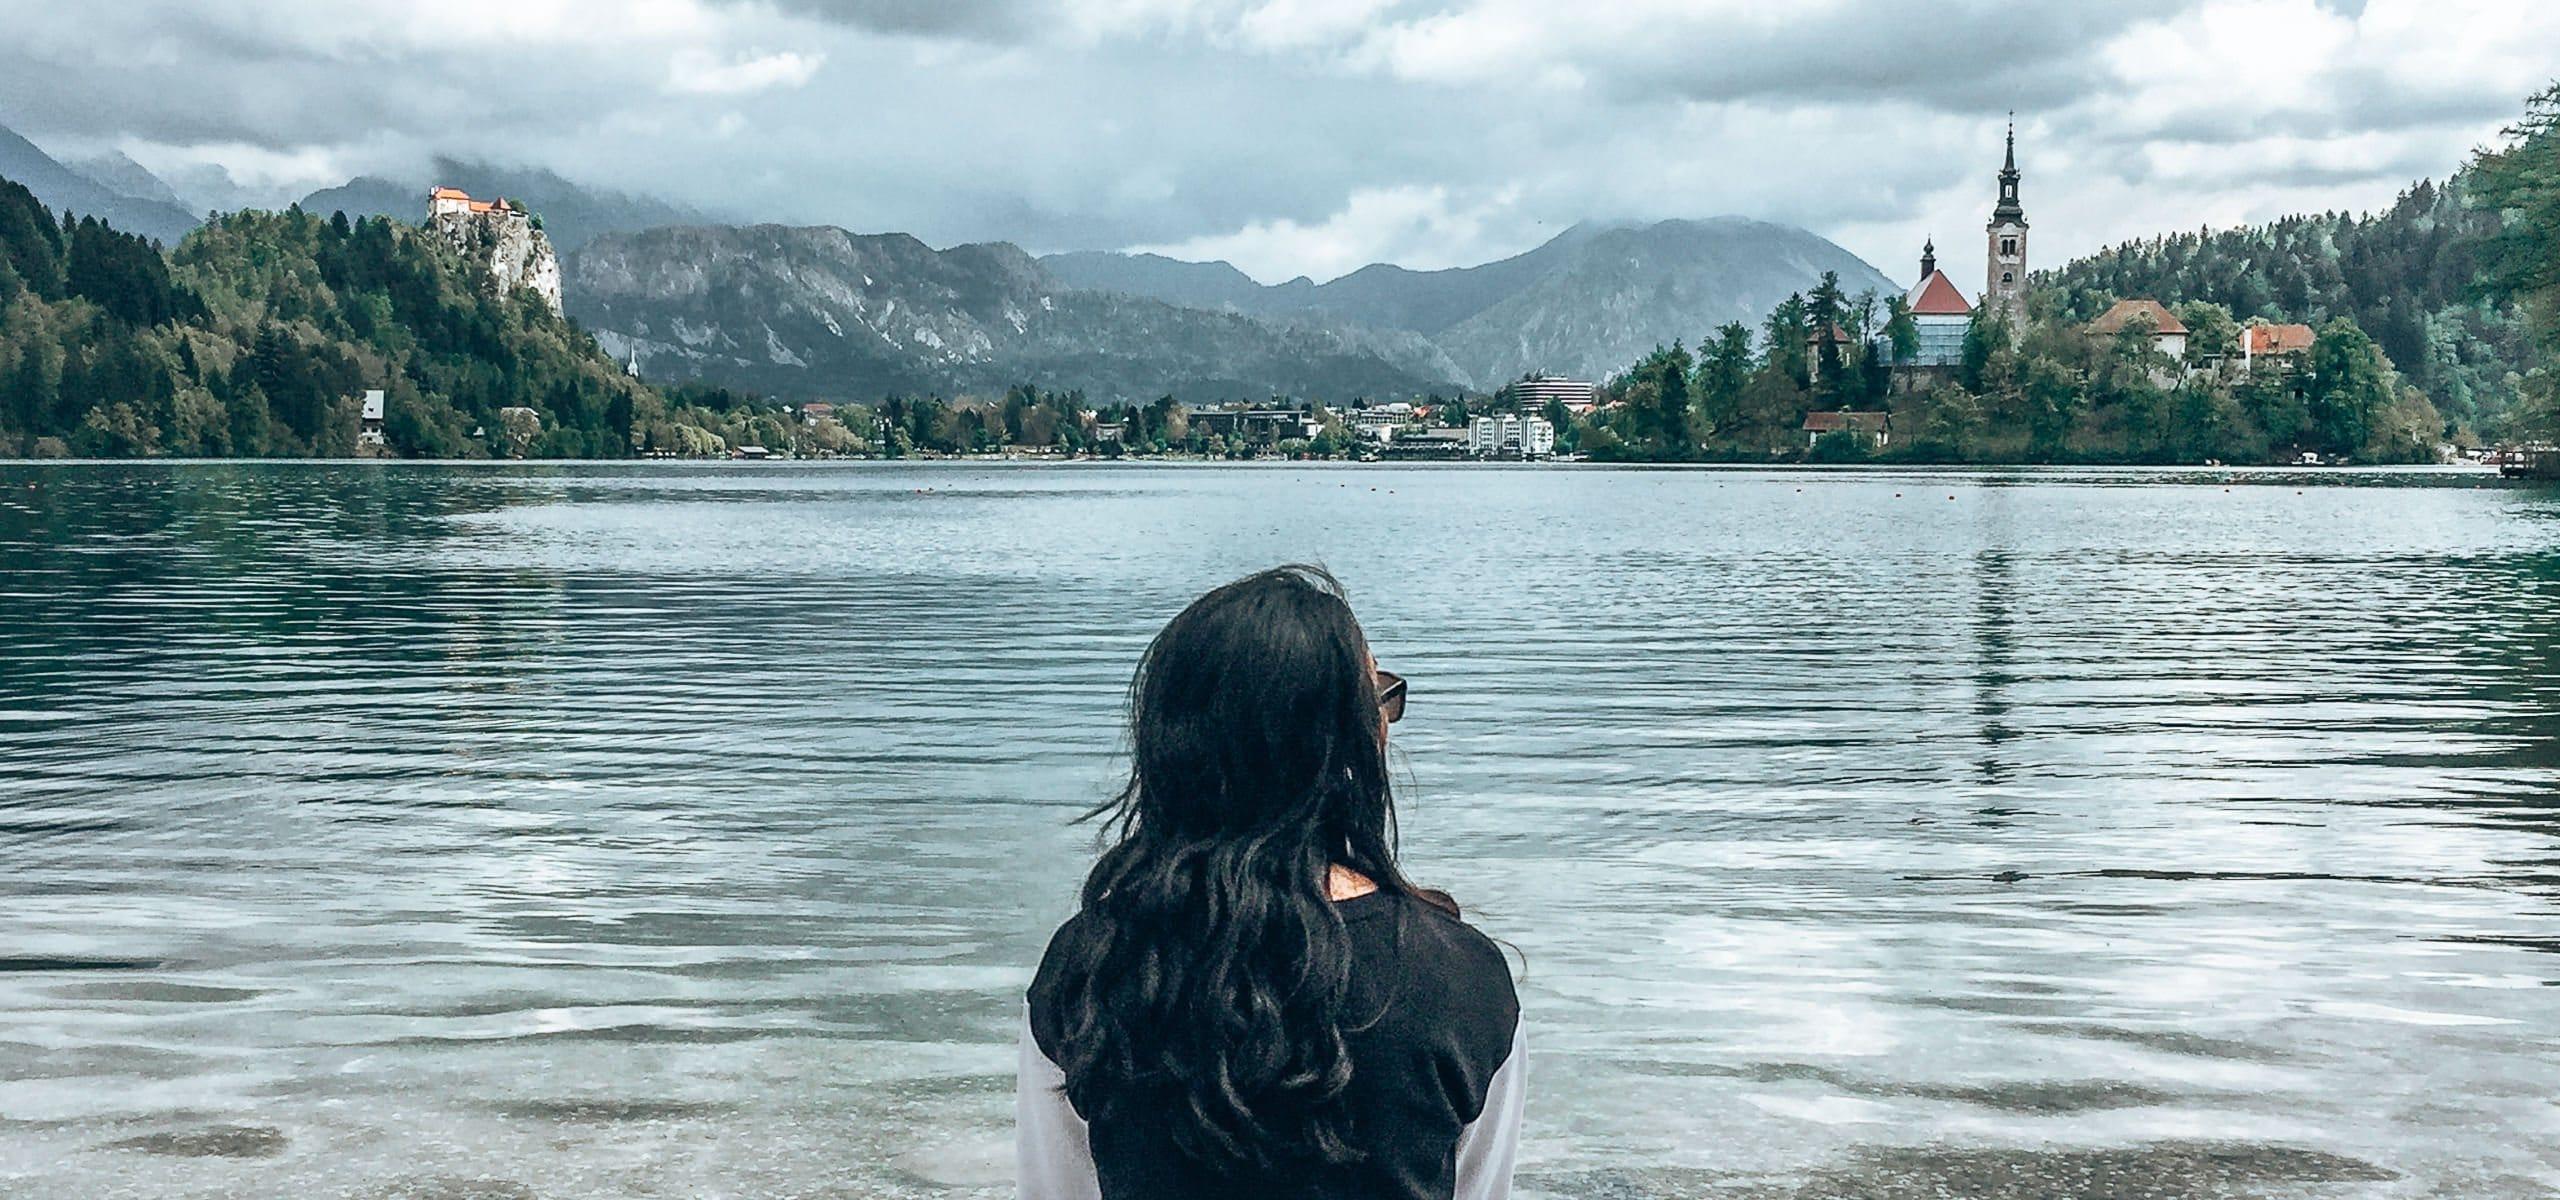 Sitting on the edge of Lake Bled, Slovenia